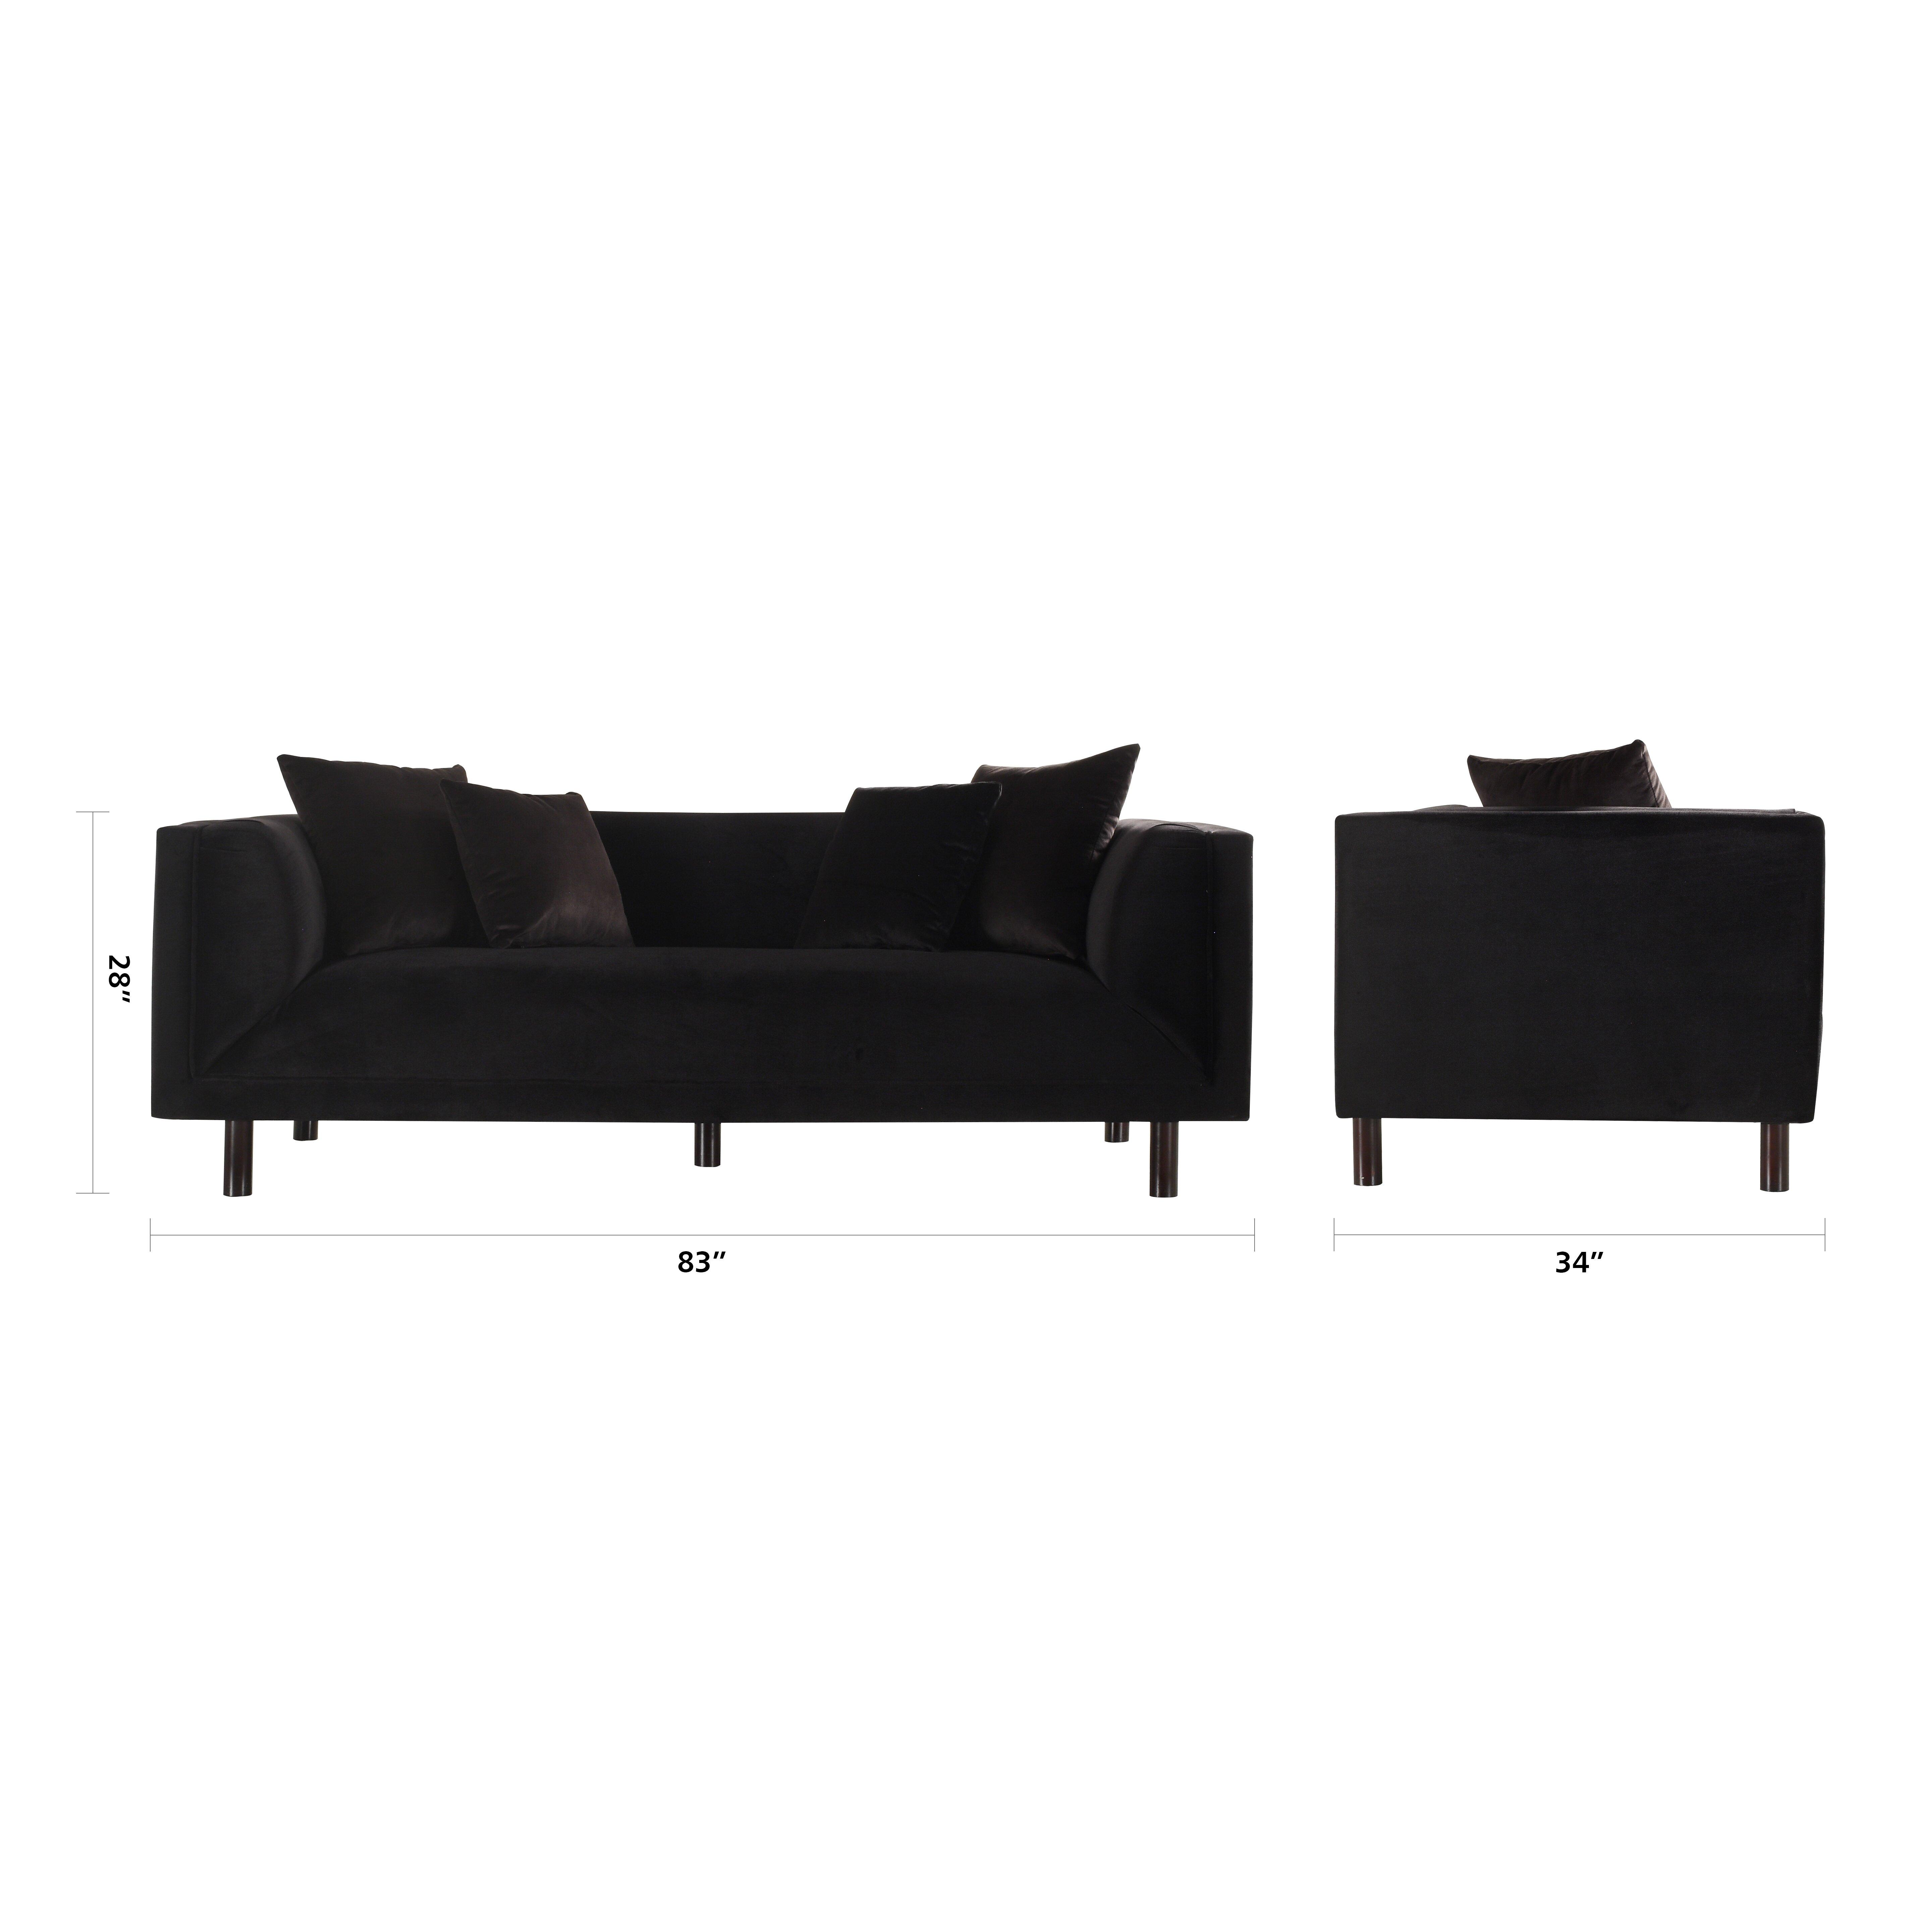 madison home usa mid century modern sofa reviews wayfair ass